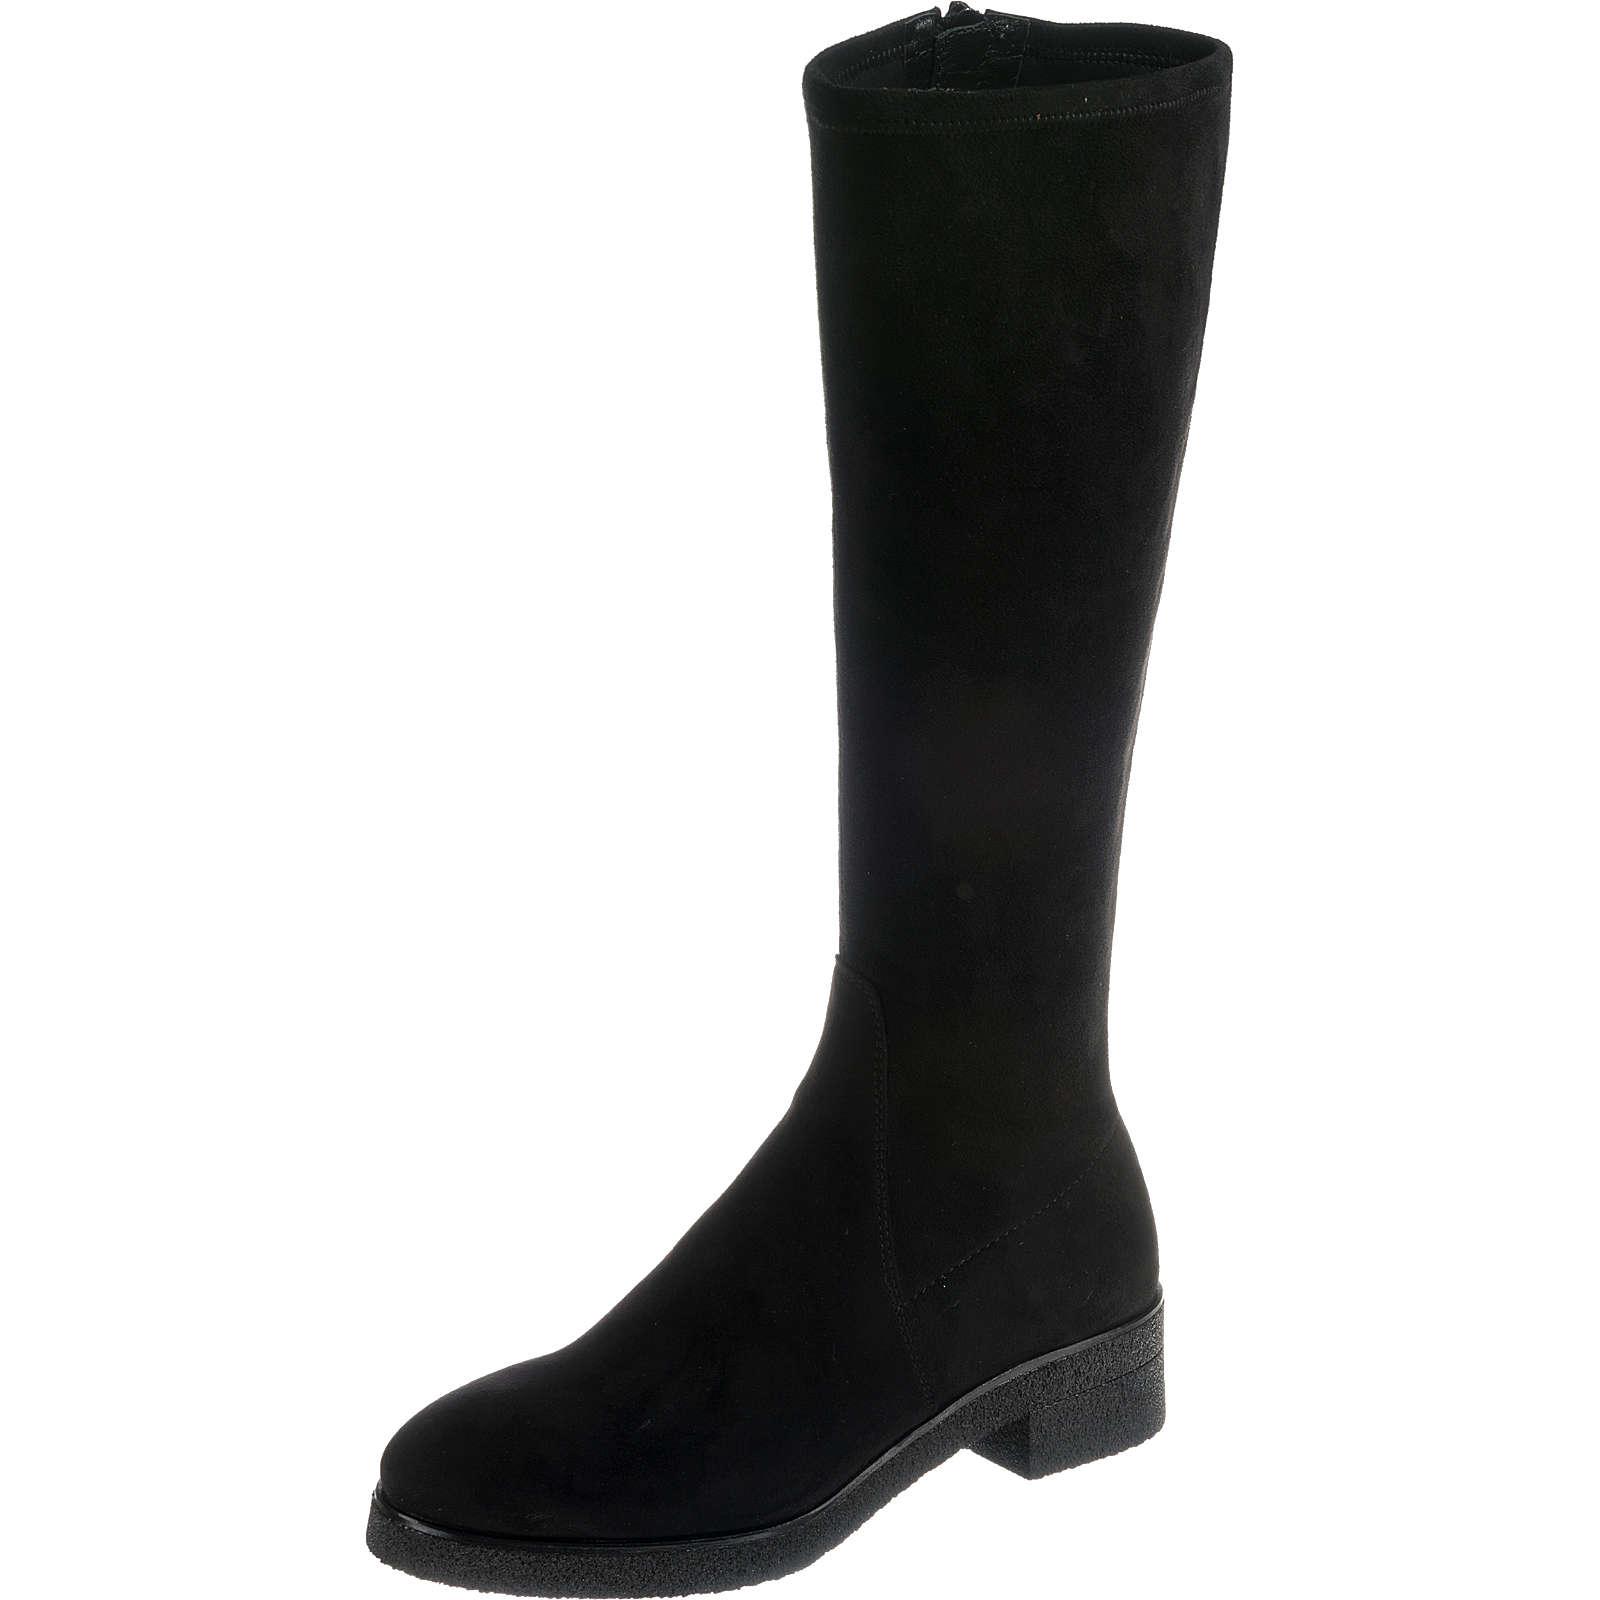 Unisa Klassische Stiefel schwarz Damen Gr. 40